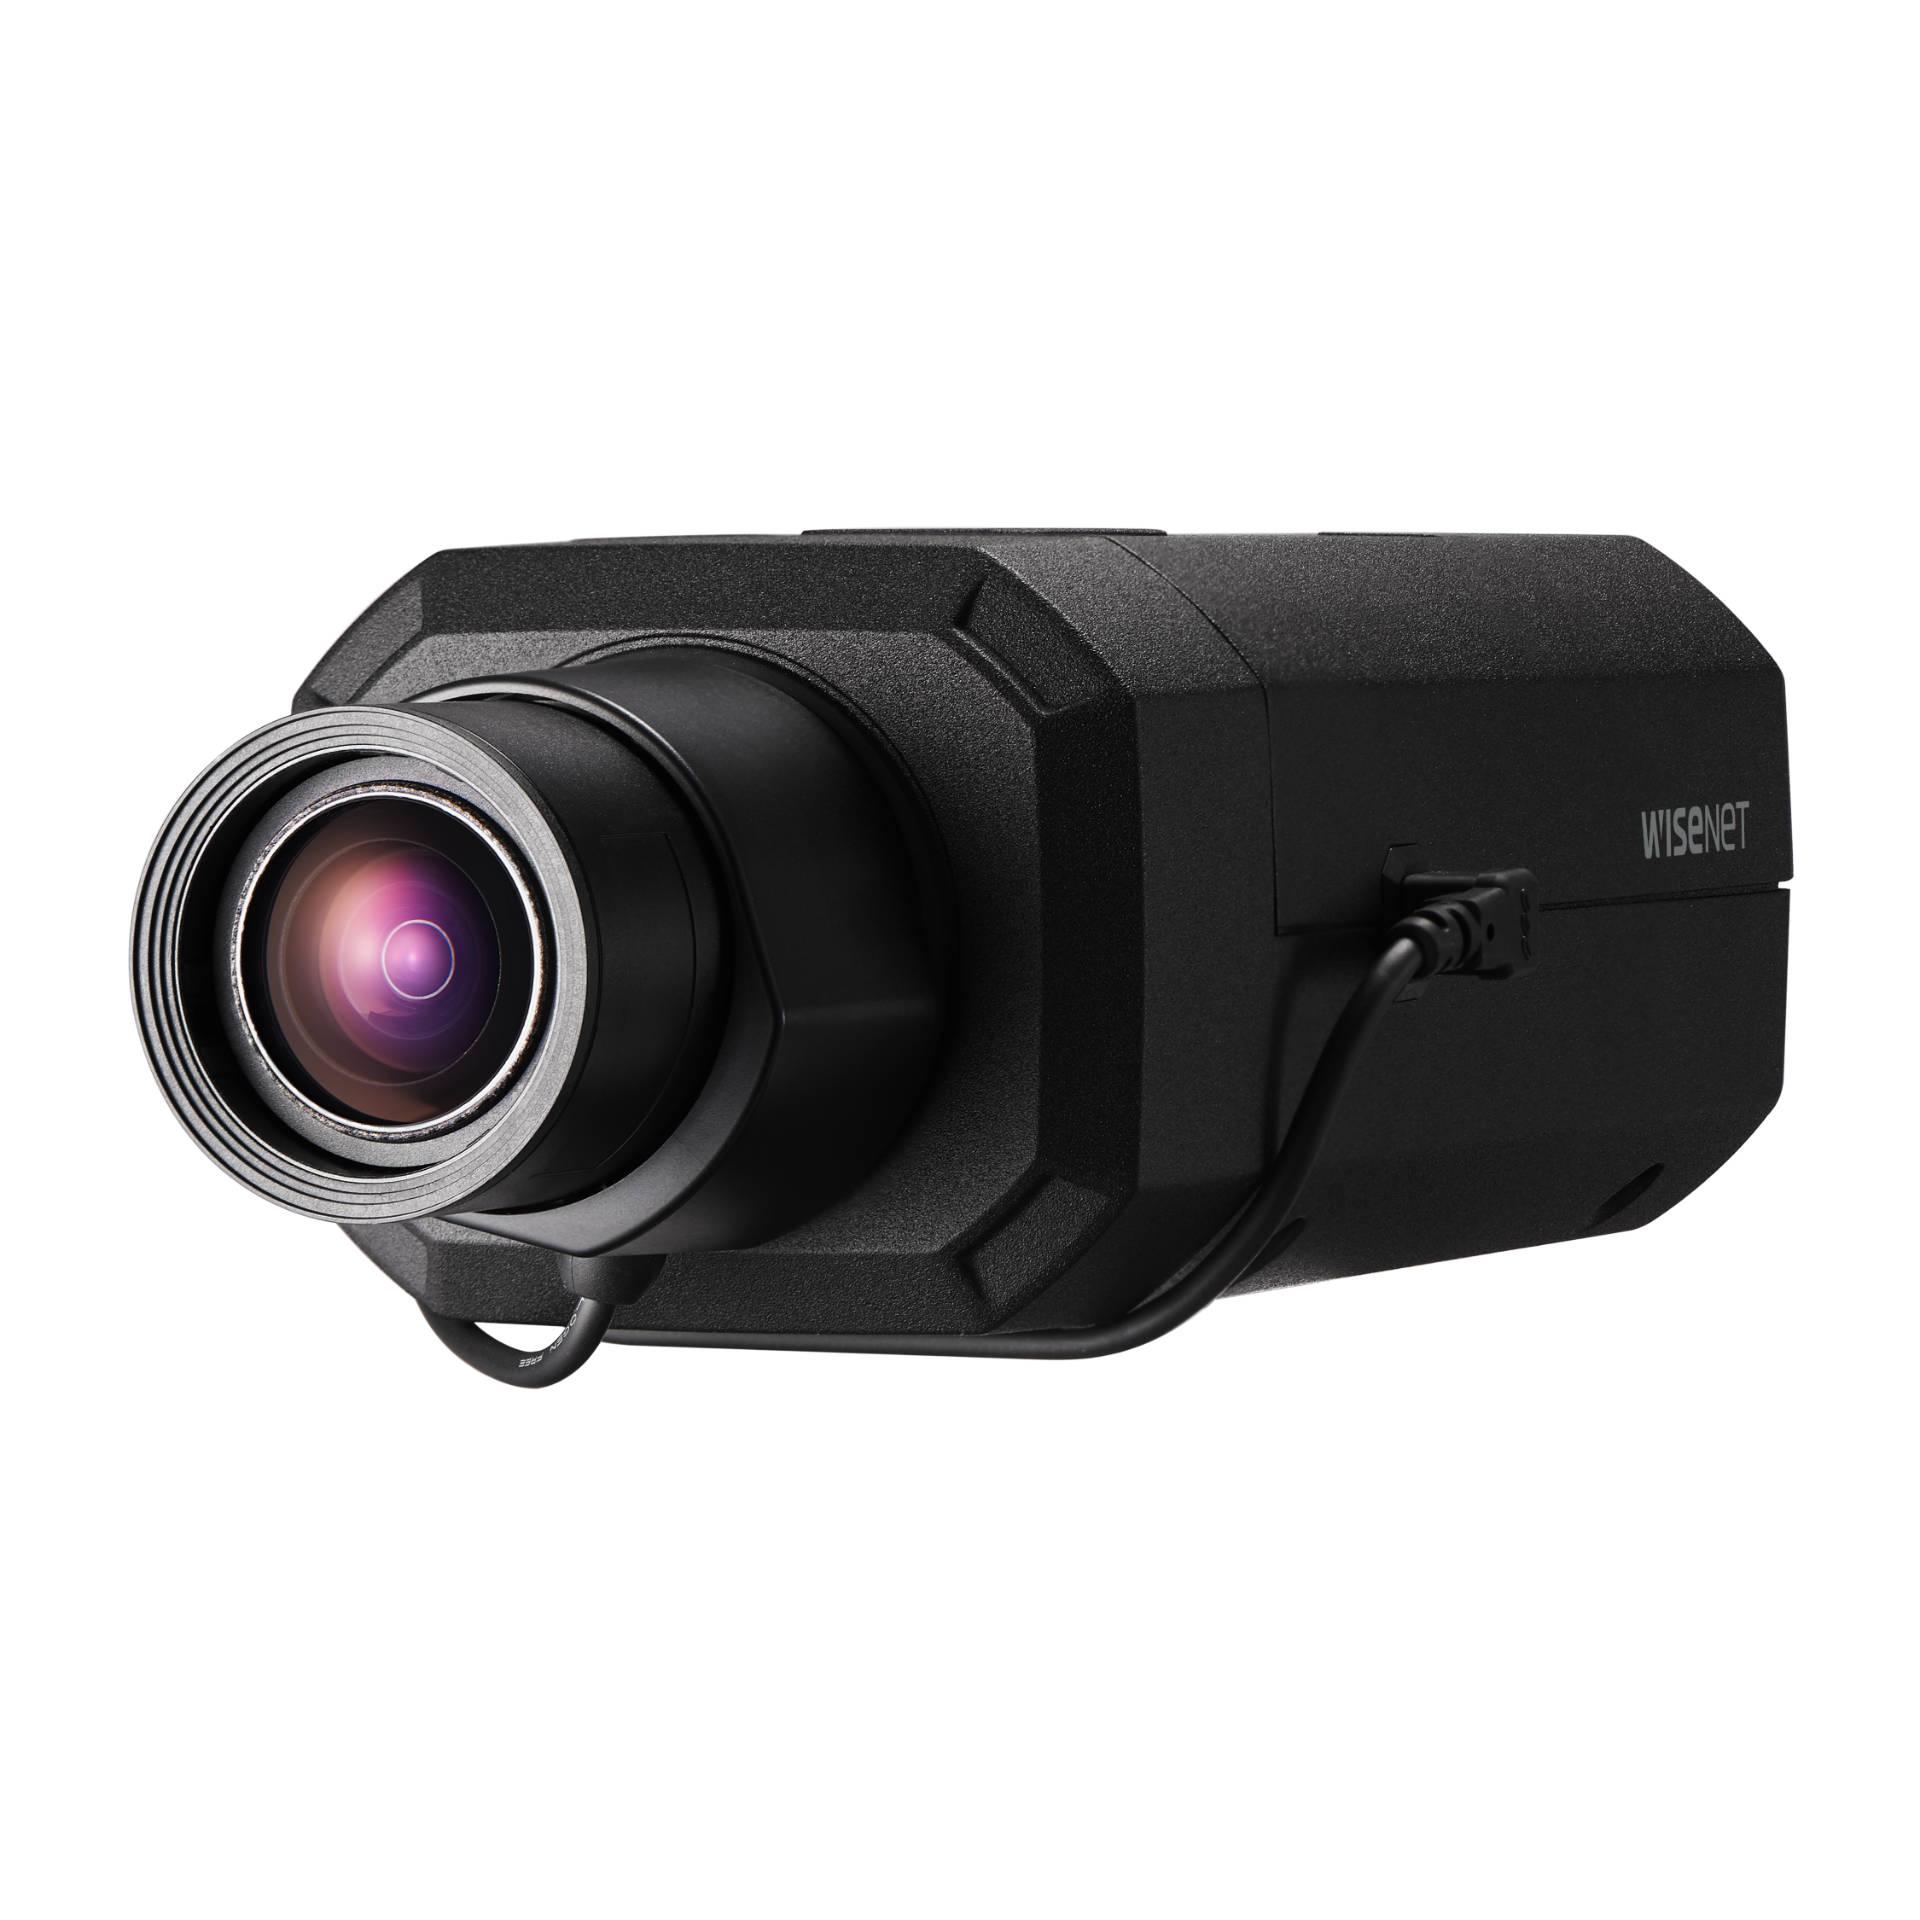 XNB-9002 4K Network Box Camera